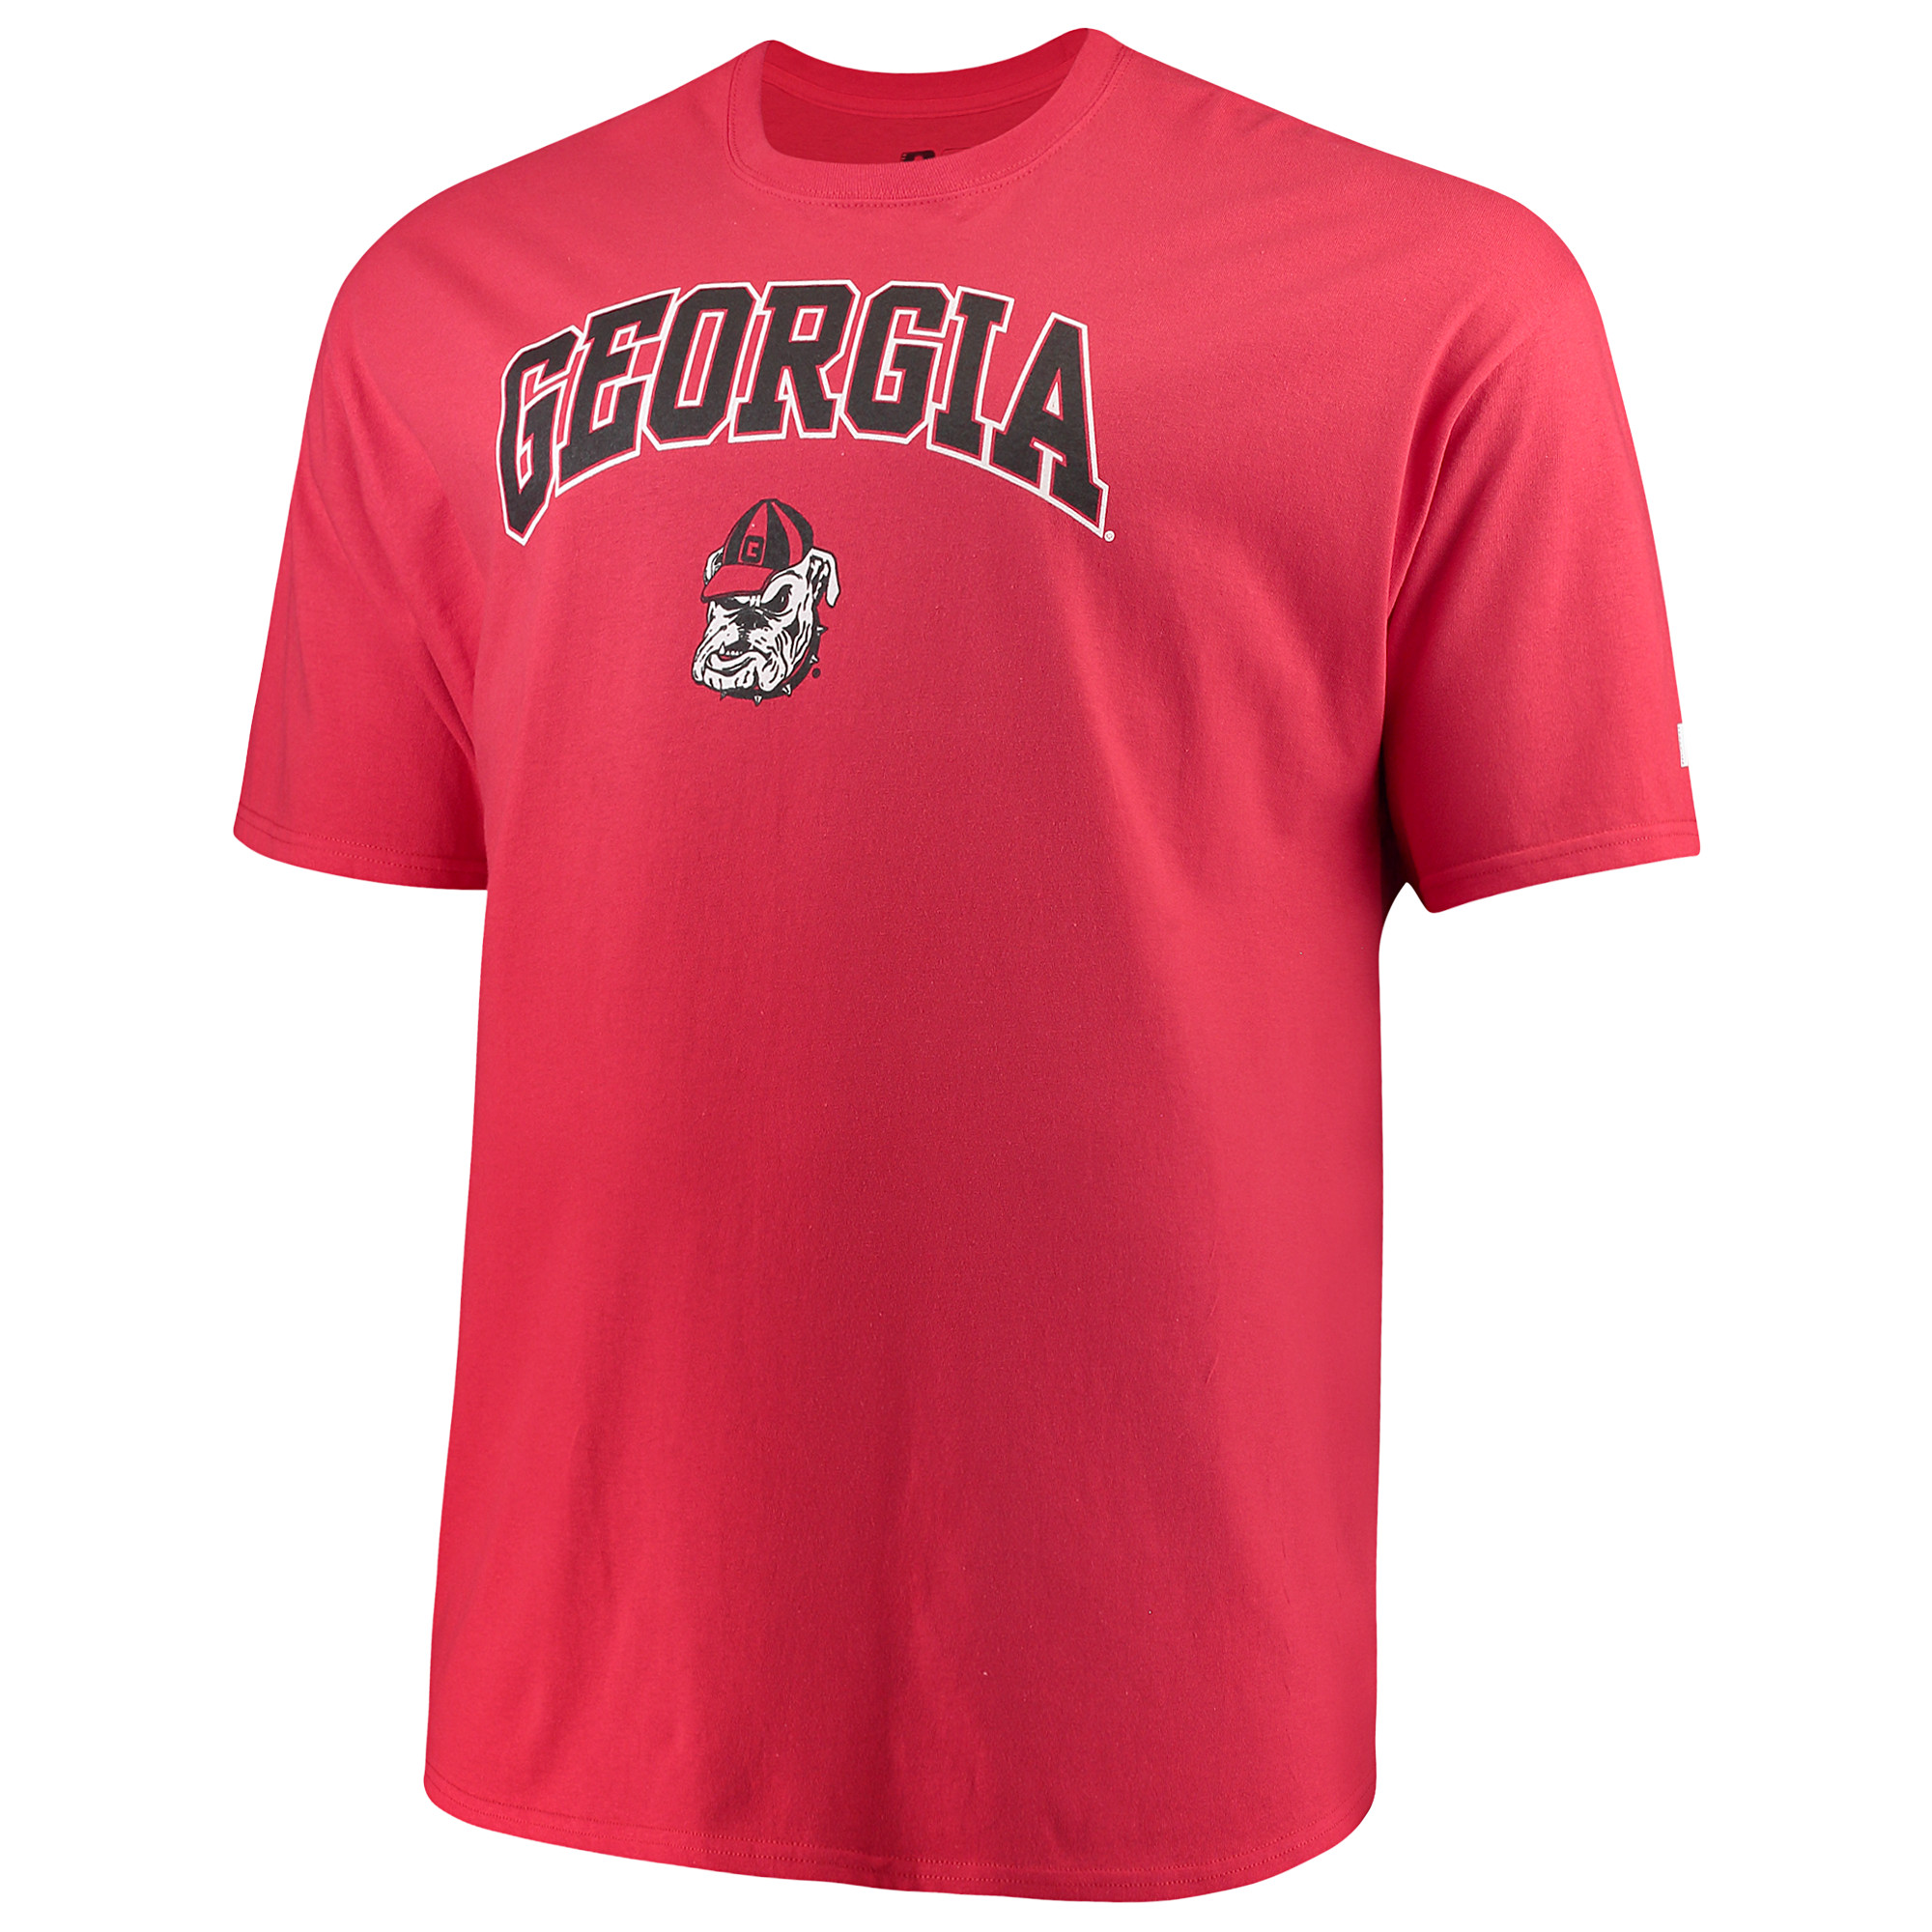 Men's Russell Red Georgia Bulldogs Big & Tall Classic Crew Neck T-Shirt